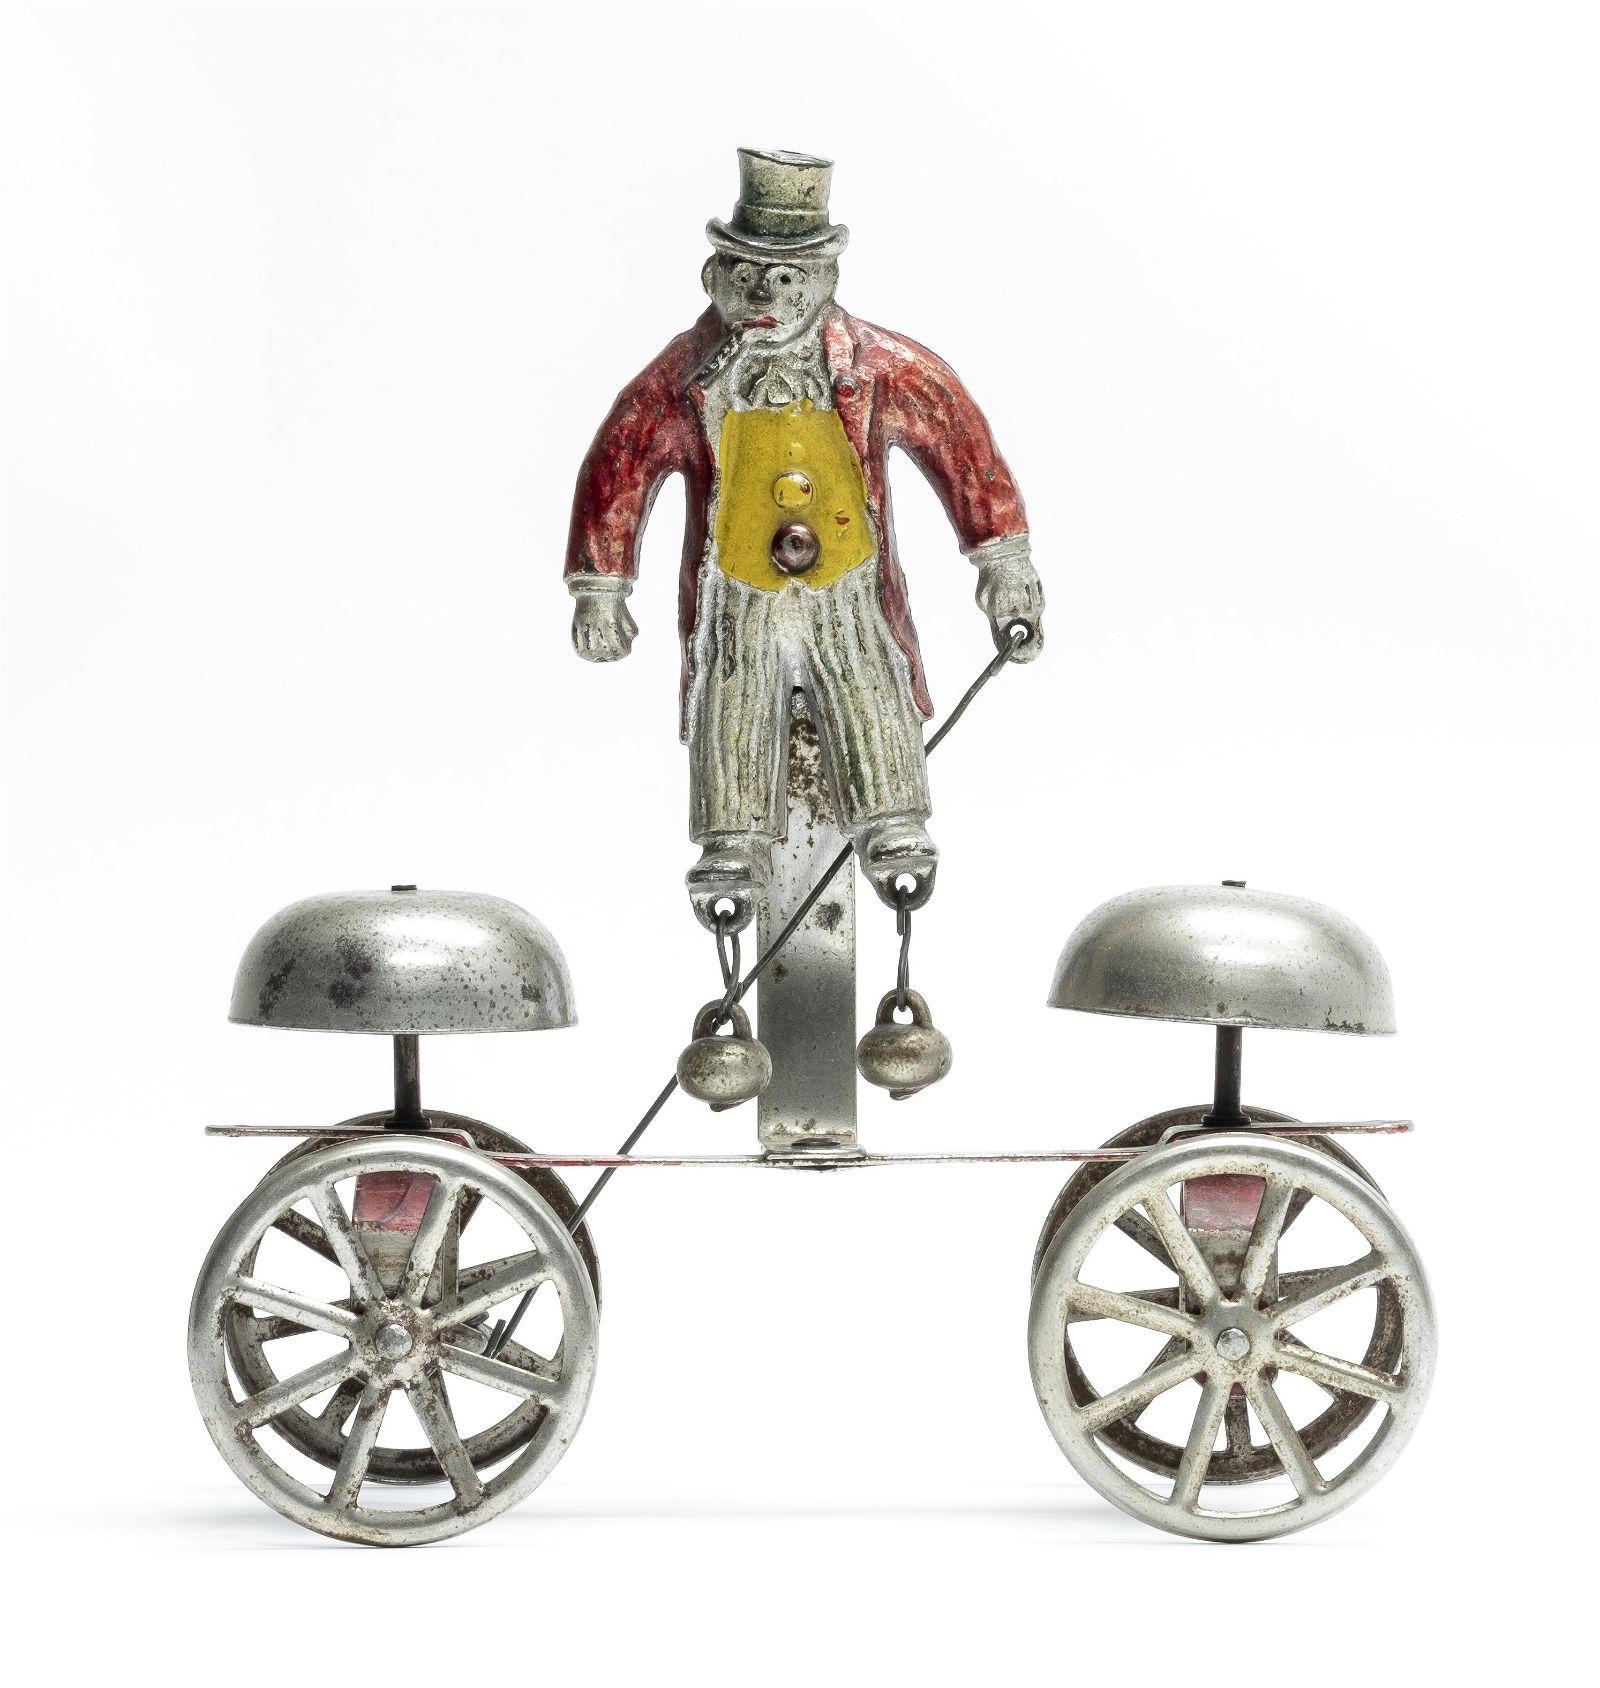 Mr. Flip Bell Toy